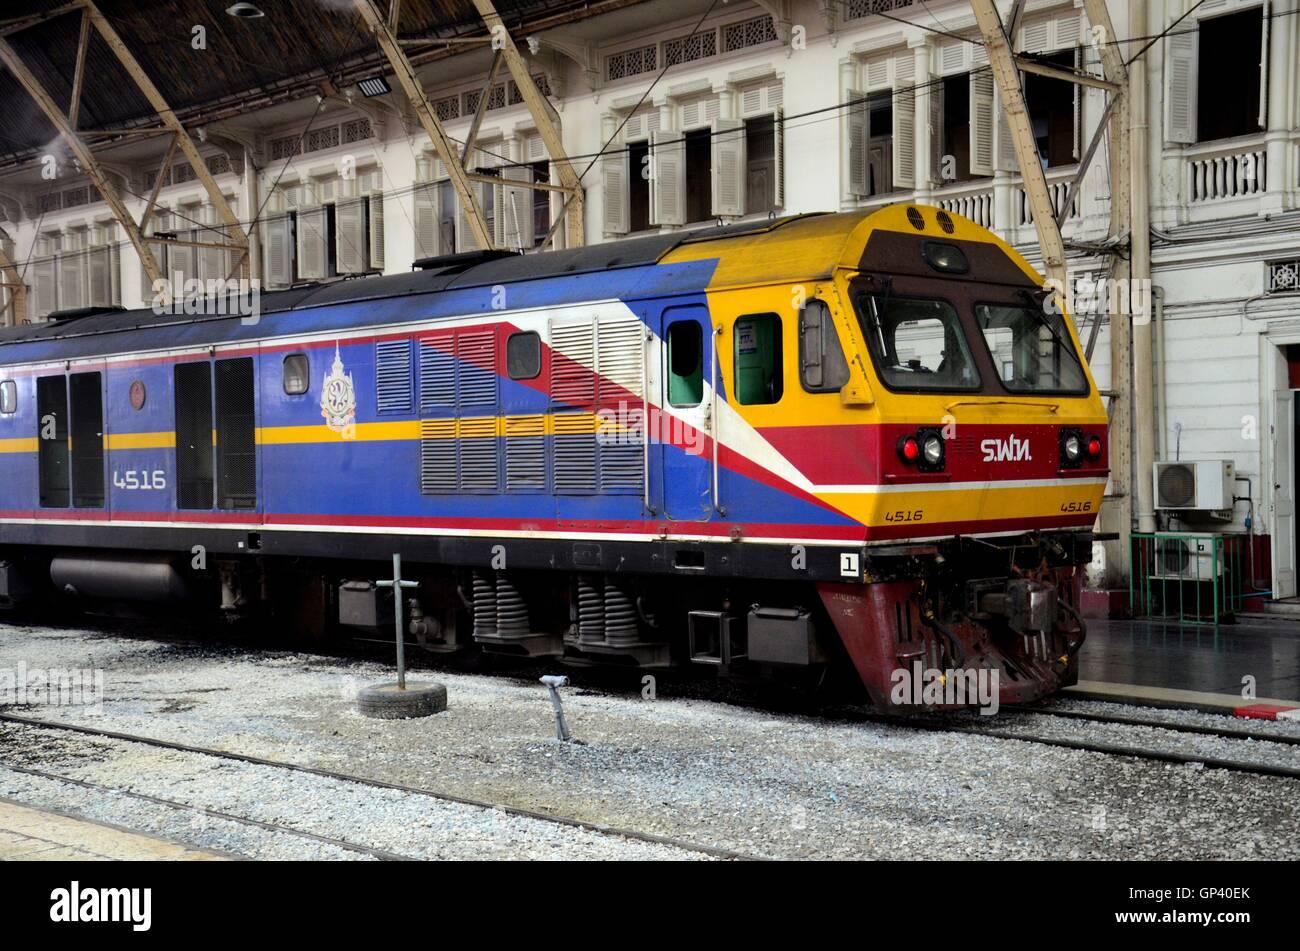 Blue and yellow Thai railways diesel electric locomotive parked at Hua Lamphong Bangkok train station Thailand Stock Photo